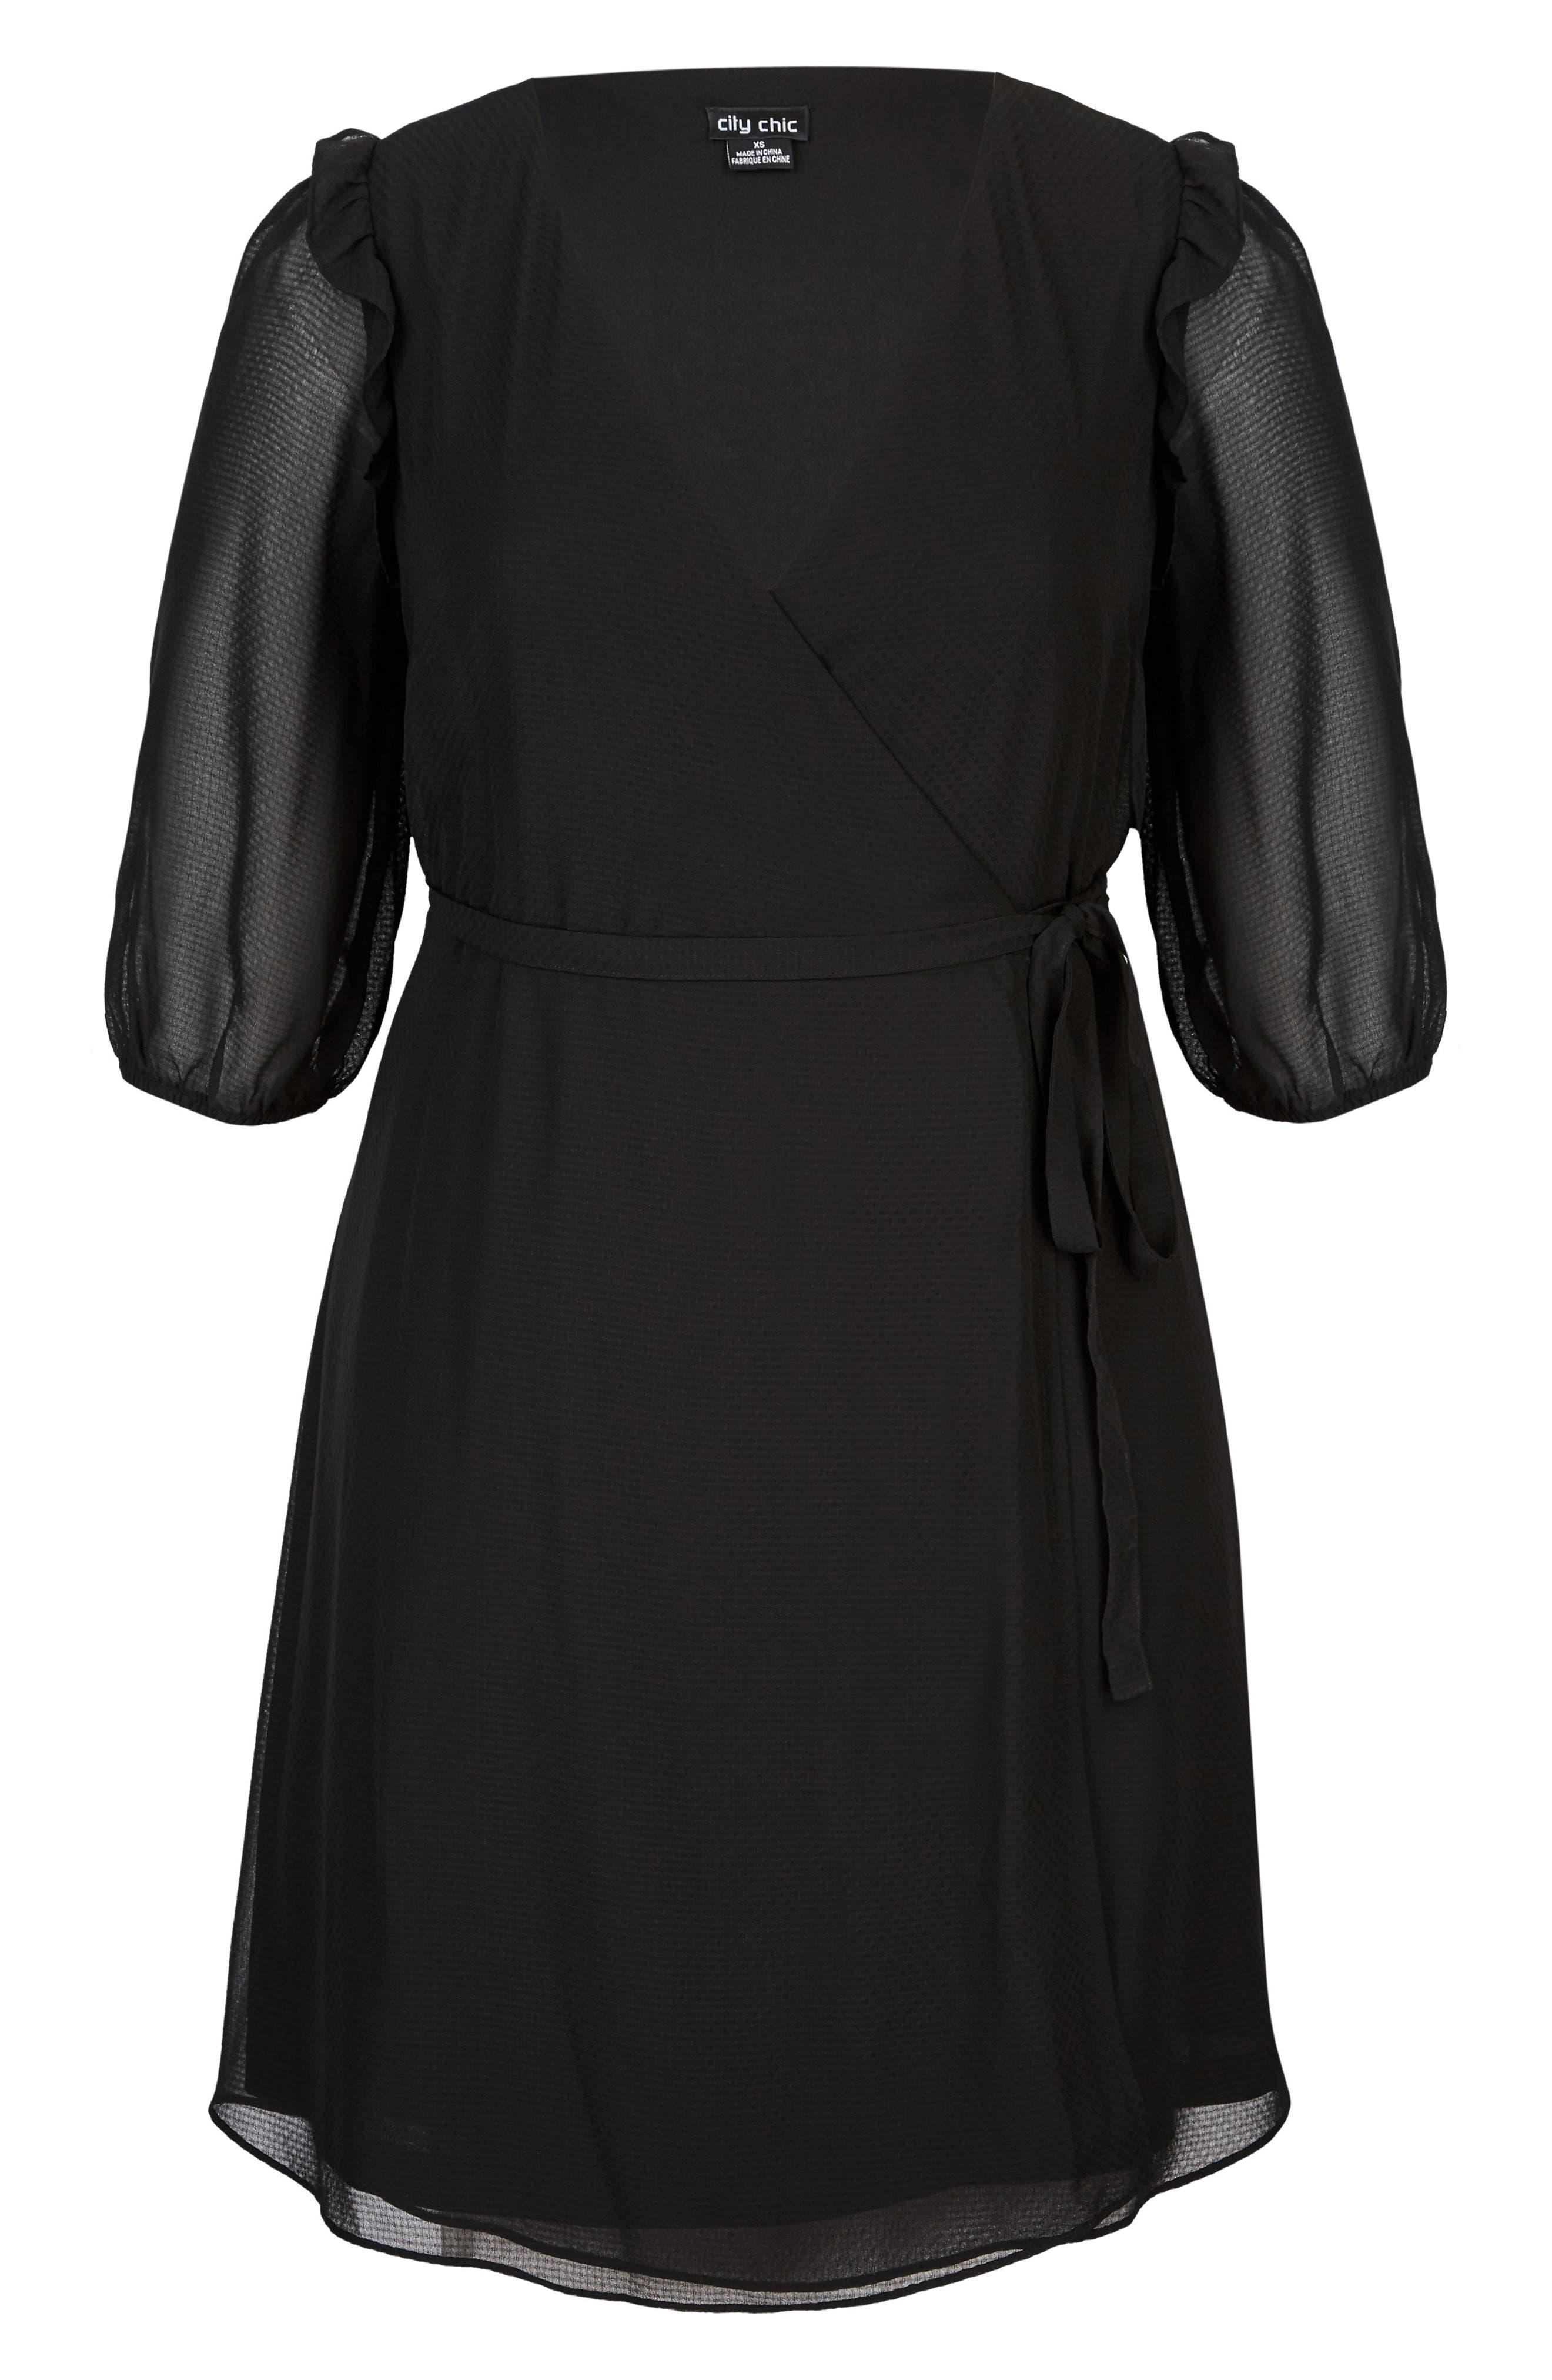 Simply So Wrap Dress,                             Alternate thumbnail 3, color,                             Black